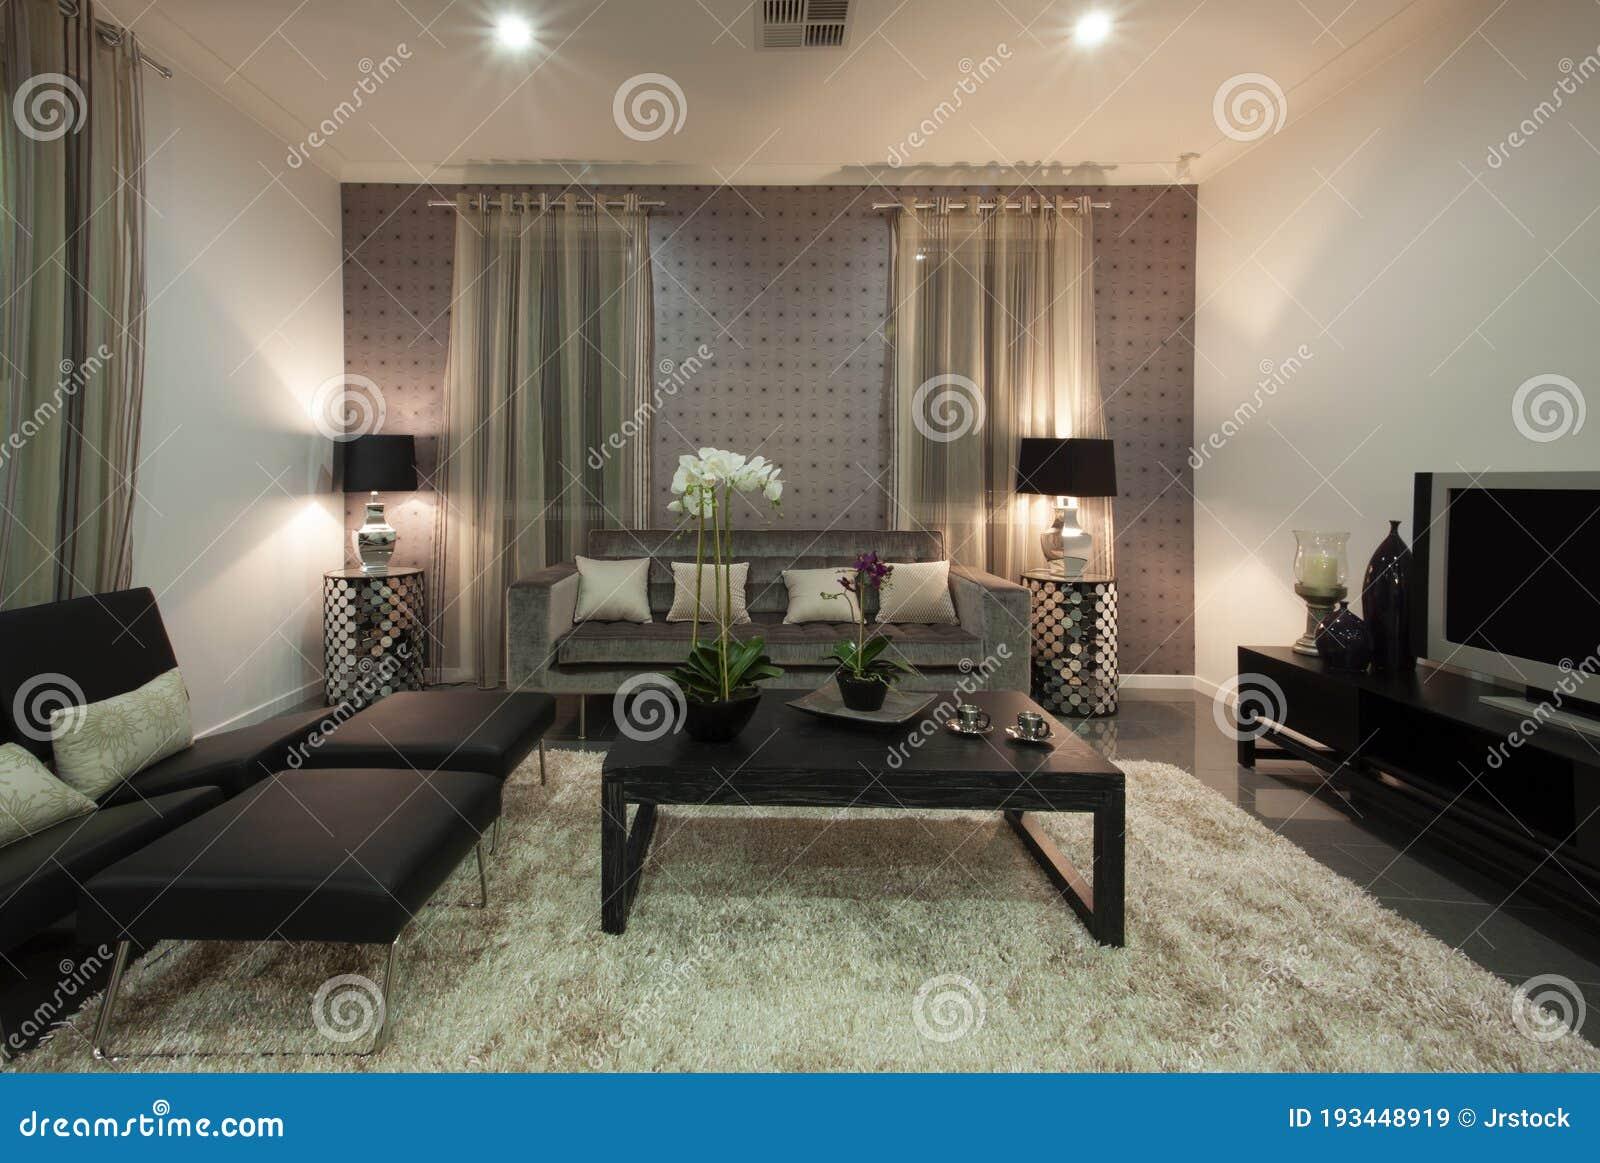 A Modern Cozy Living Room Interior Design Stock Image   Image of ...